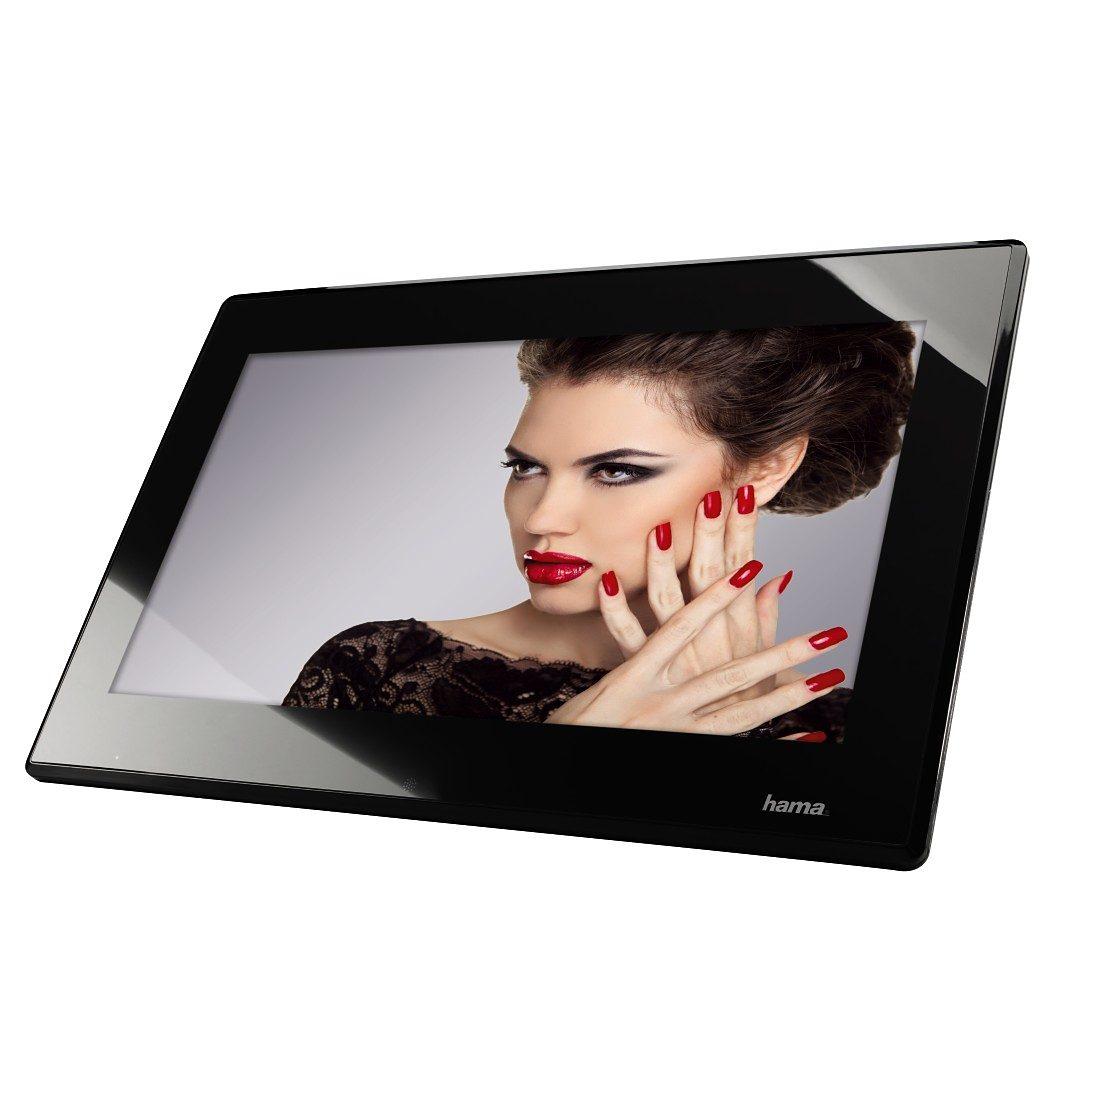 Hama Digitaler Bilderrahmen Full HD, 39,6 cm (15,6 Zoll) »4 GB int. Speicher USB HDMI MP3 SD«